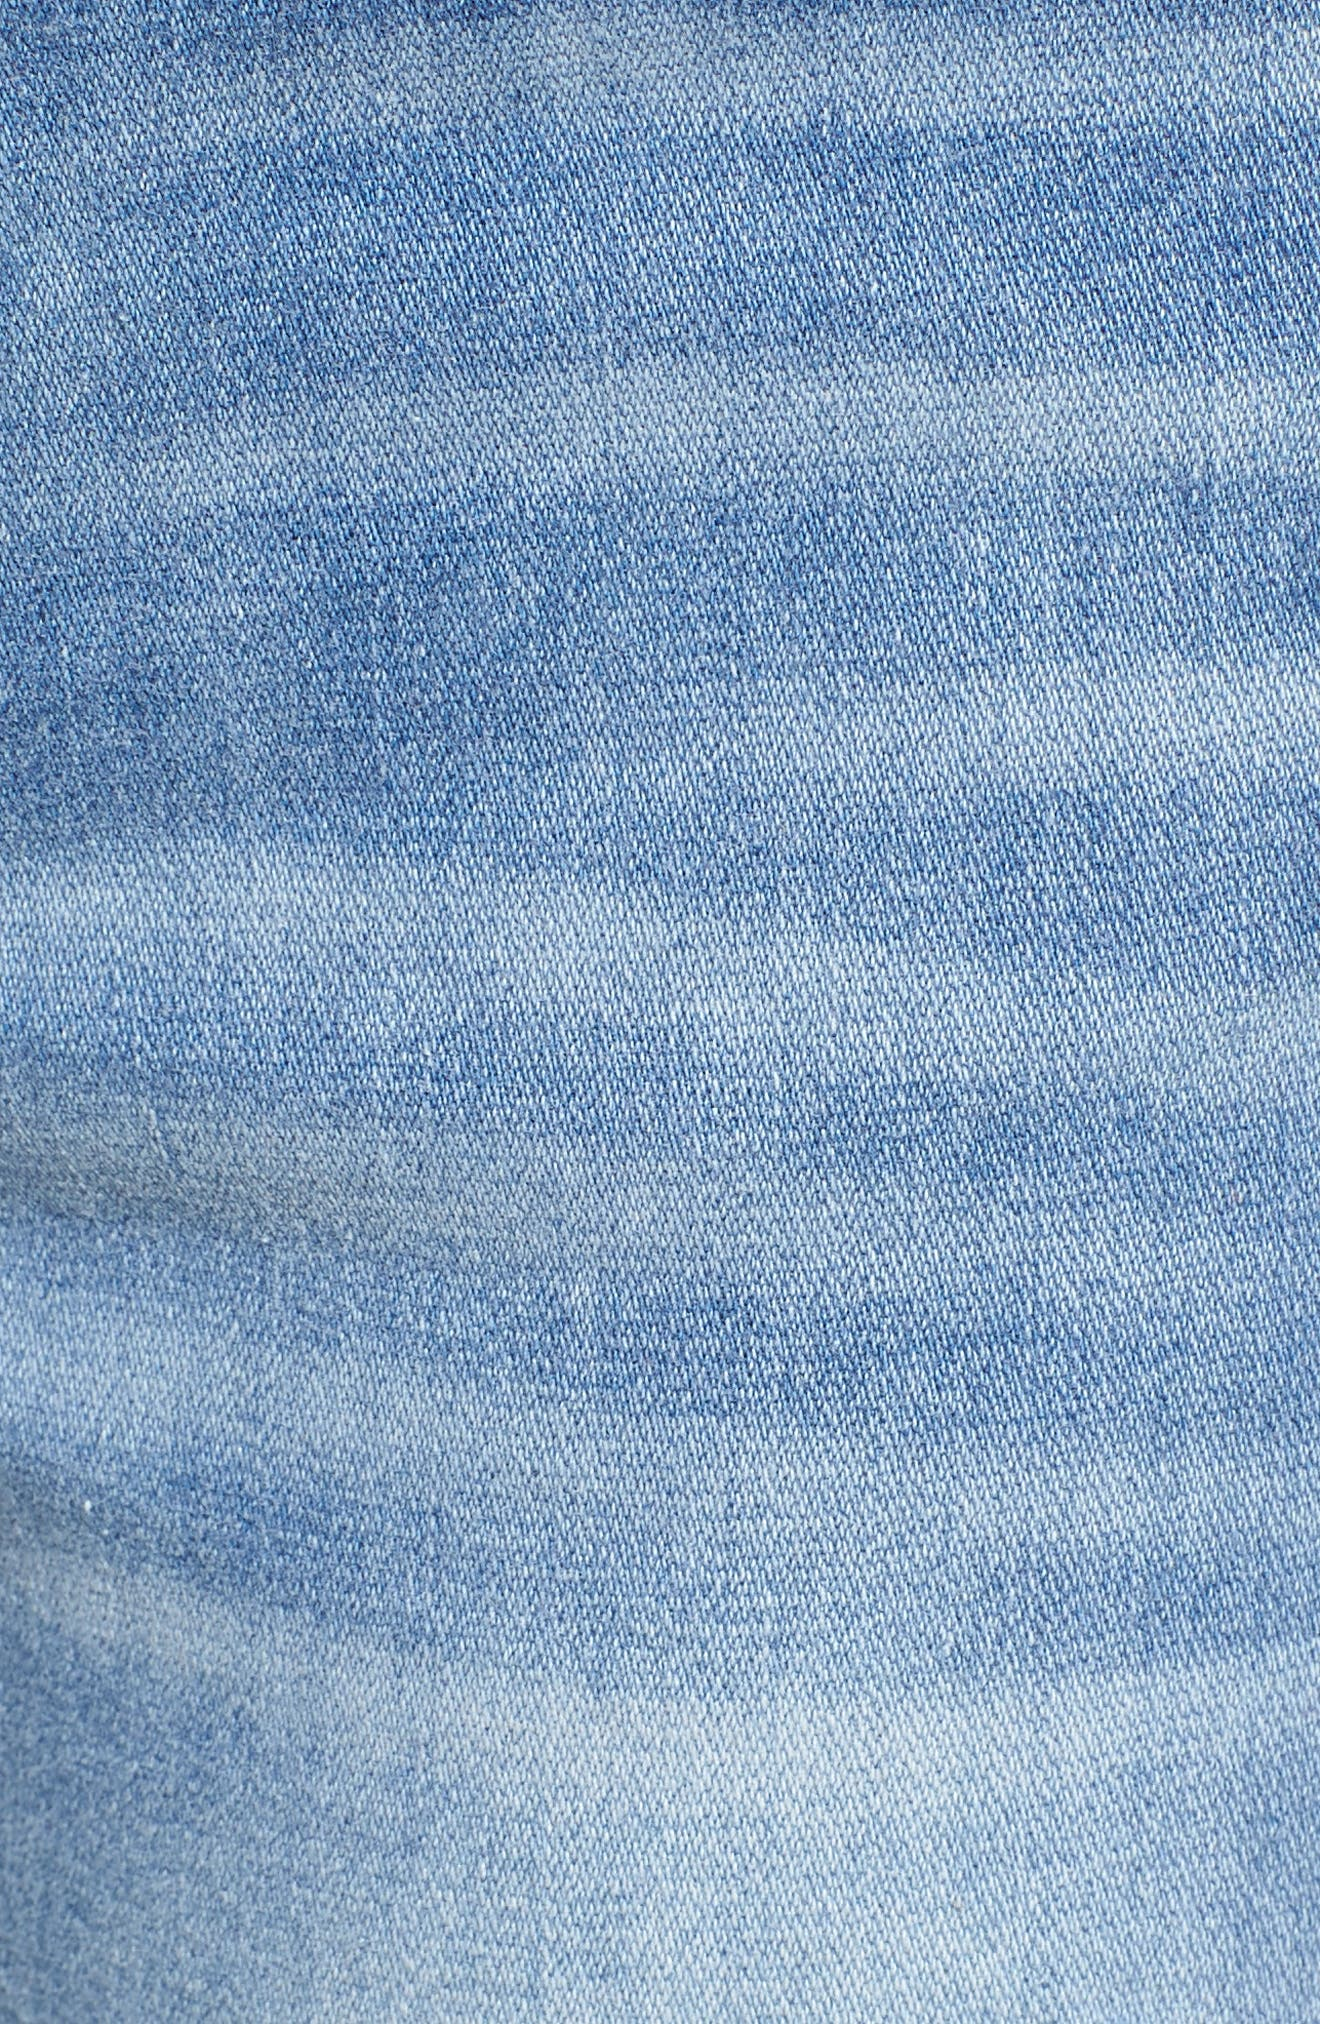 Marley Distressed Crop Skinny Jeans,                             Alternate thumbnail 6, color,                             Light Medium Wash